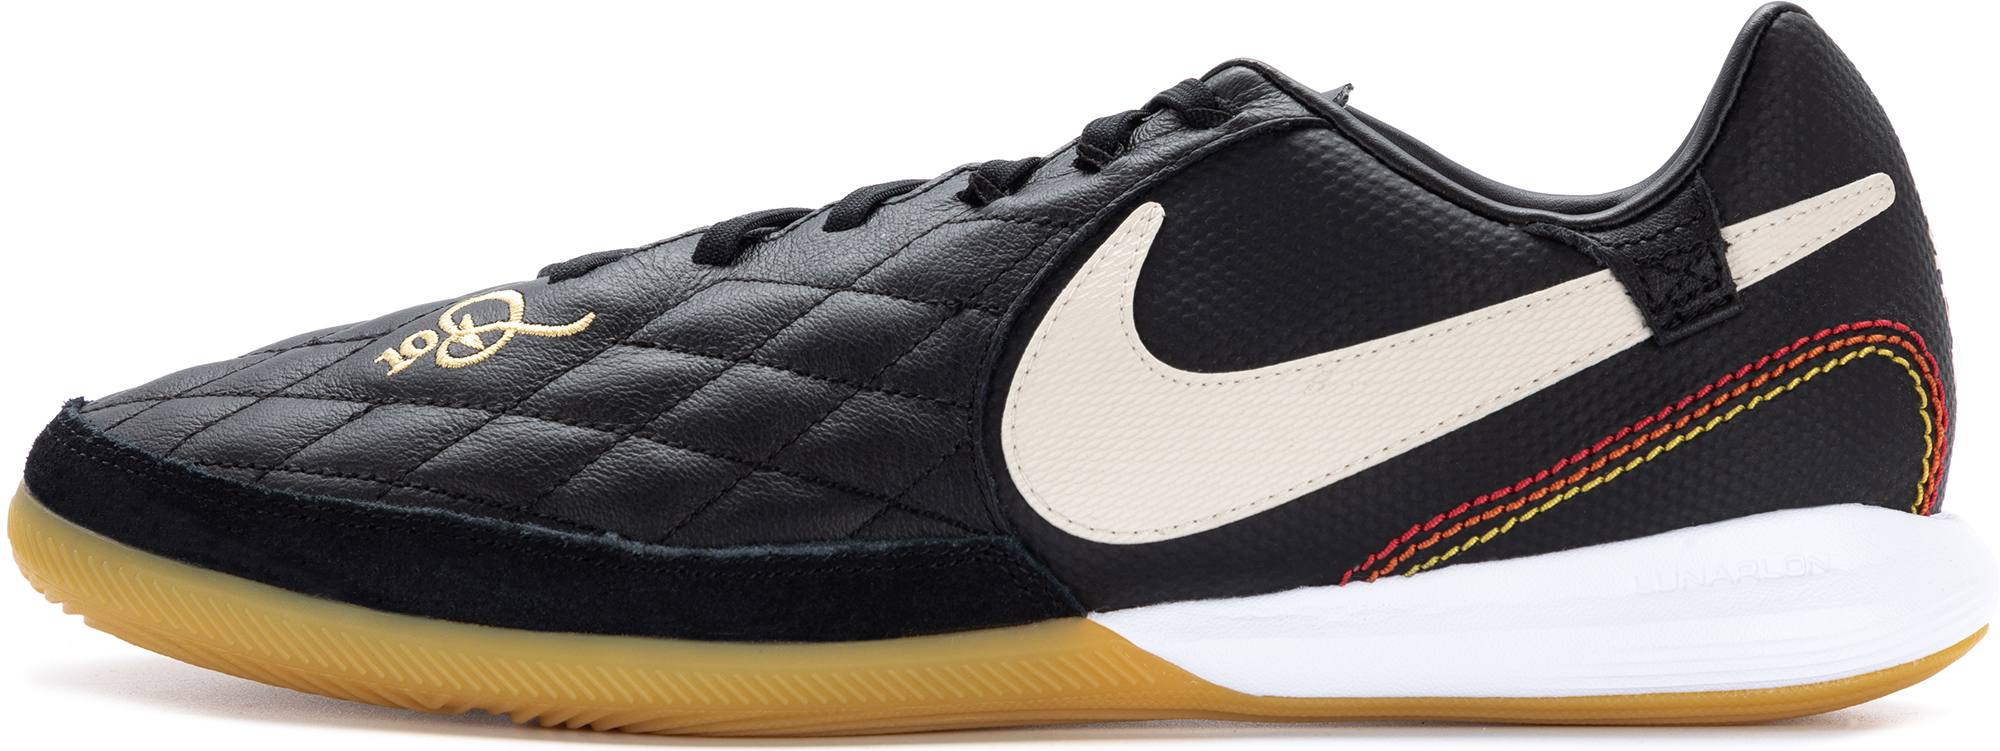 Nike Бутсы мужские Nike Lunar Legend 7 Pro 10R IC, размер 42